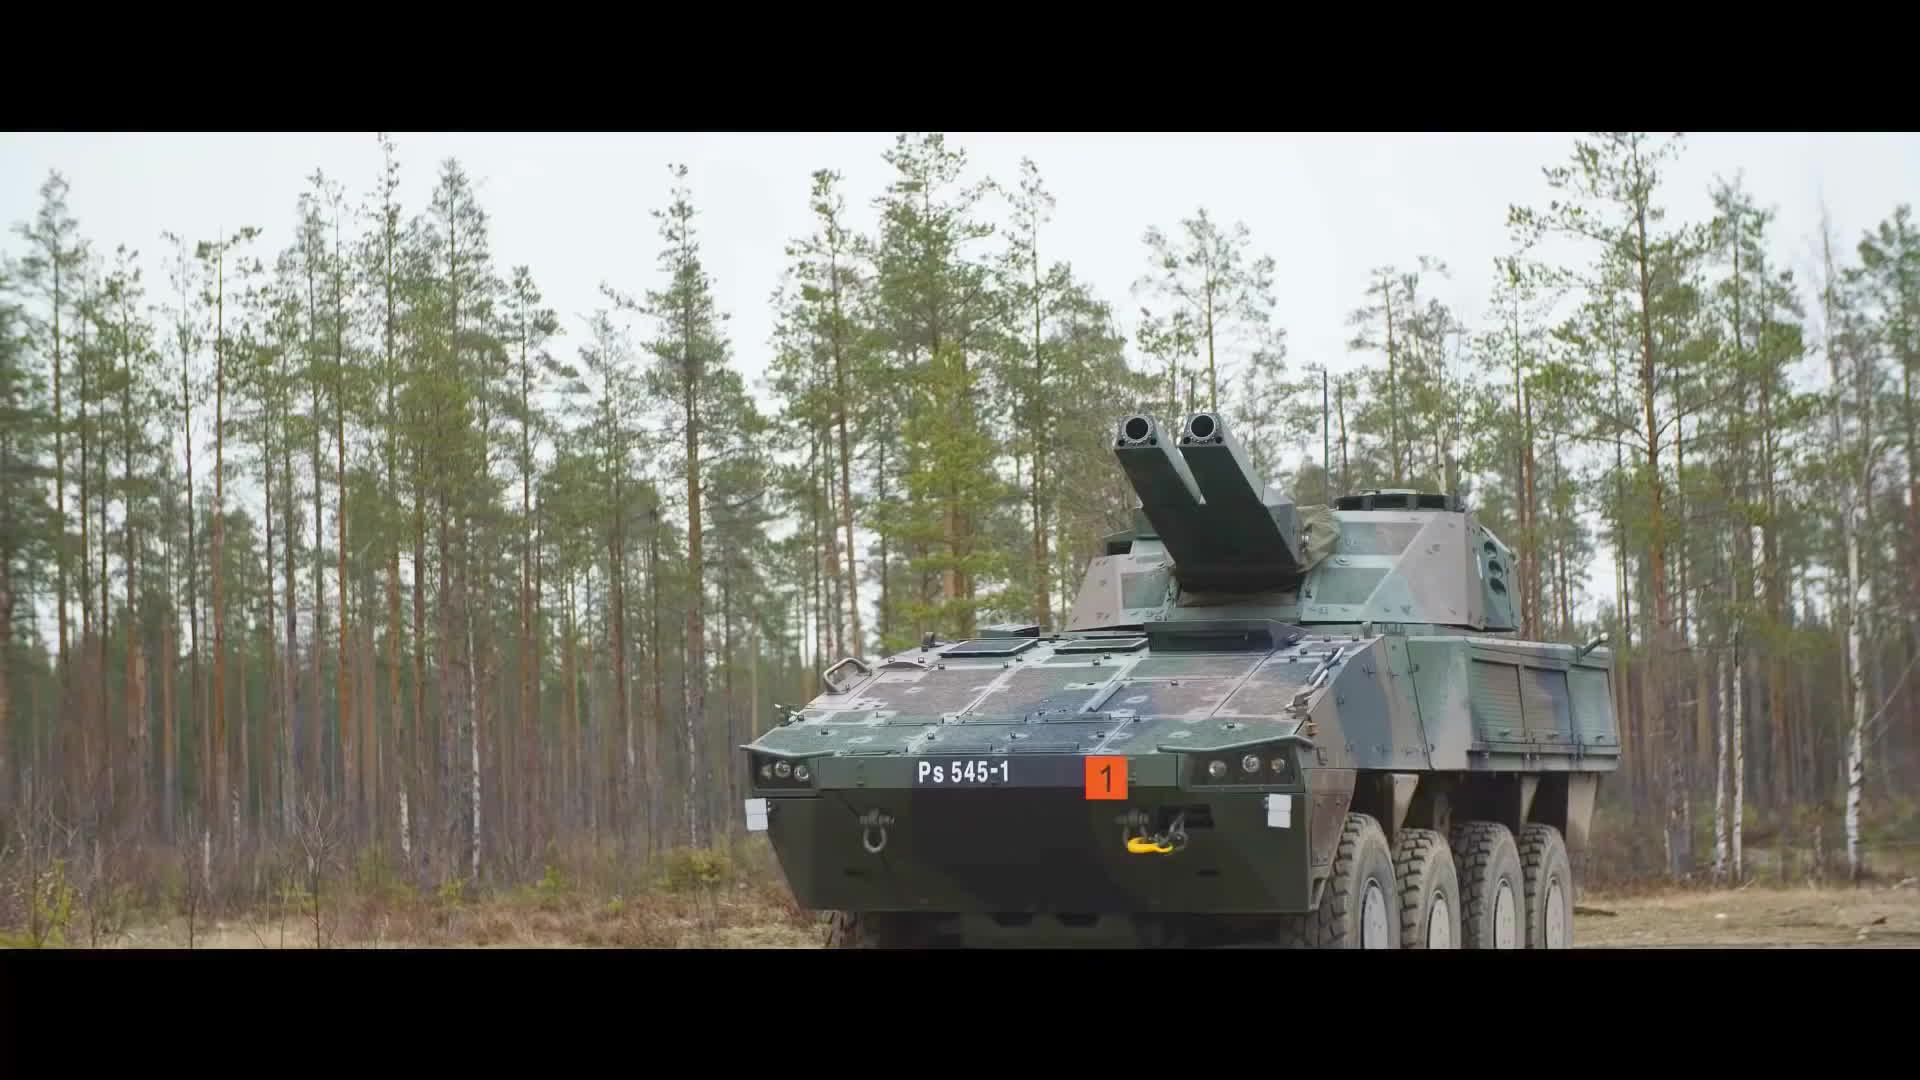 military, Patria - Amos & Nemo 120mm Advanced Mortar Systems [1080p] GIFs